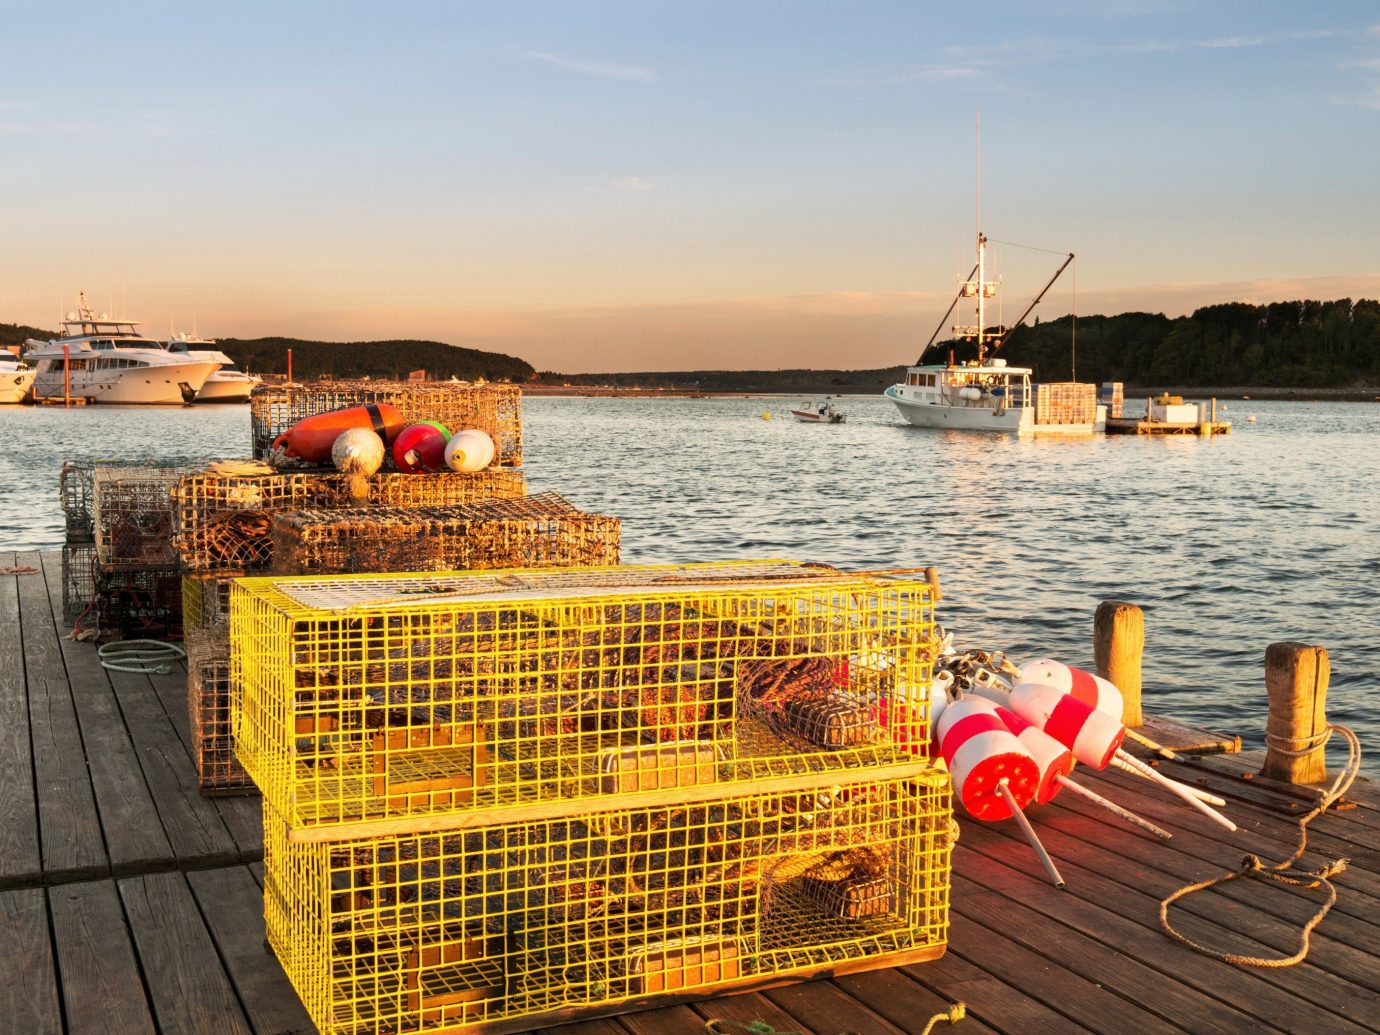 Trip Ideas sky water outdoor Boat pier dock Sea vehicle vacation wooden evening Coast overlooking